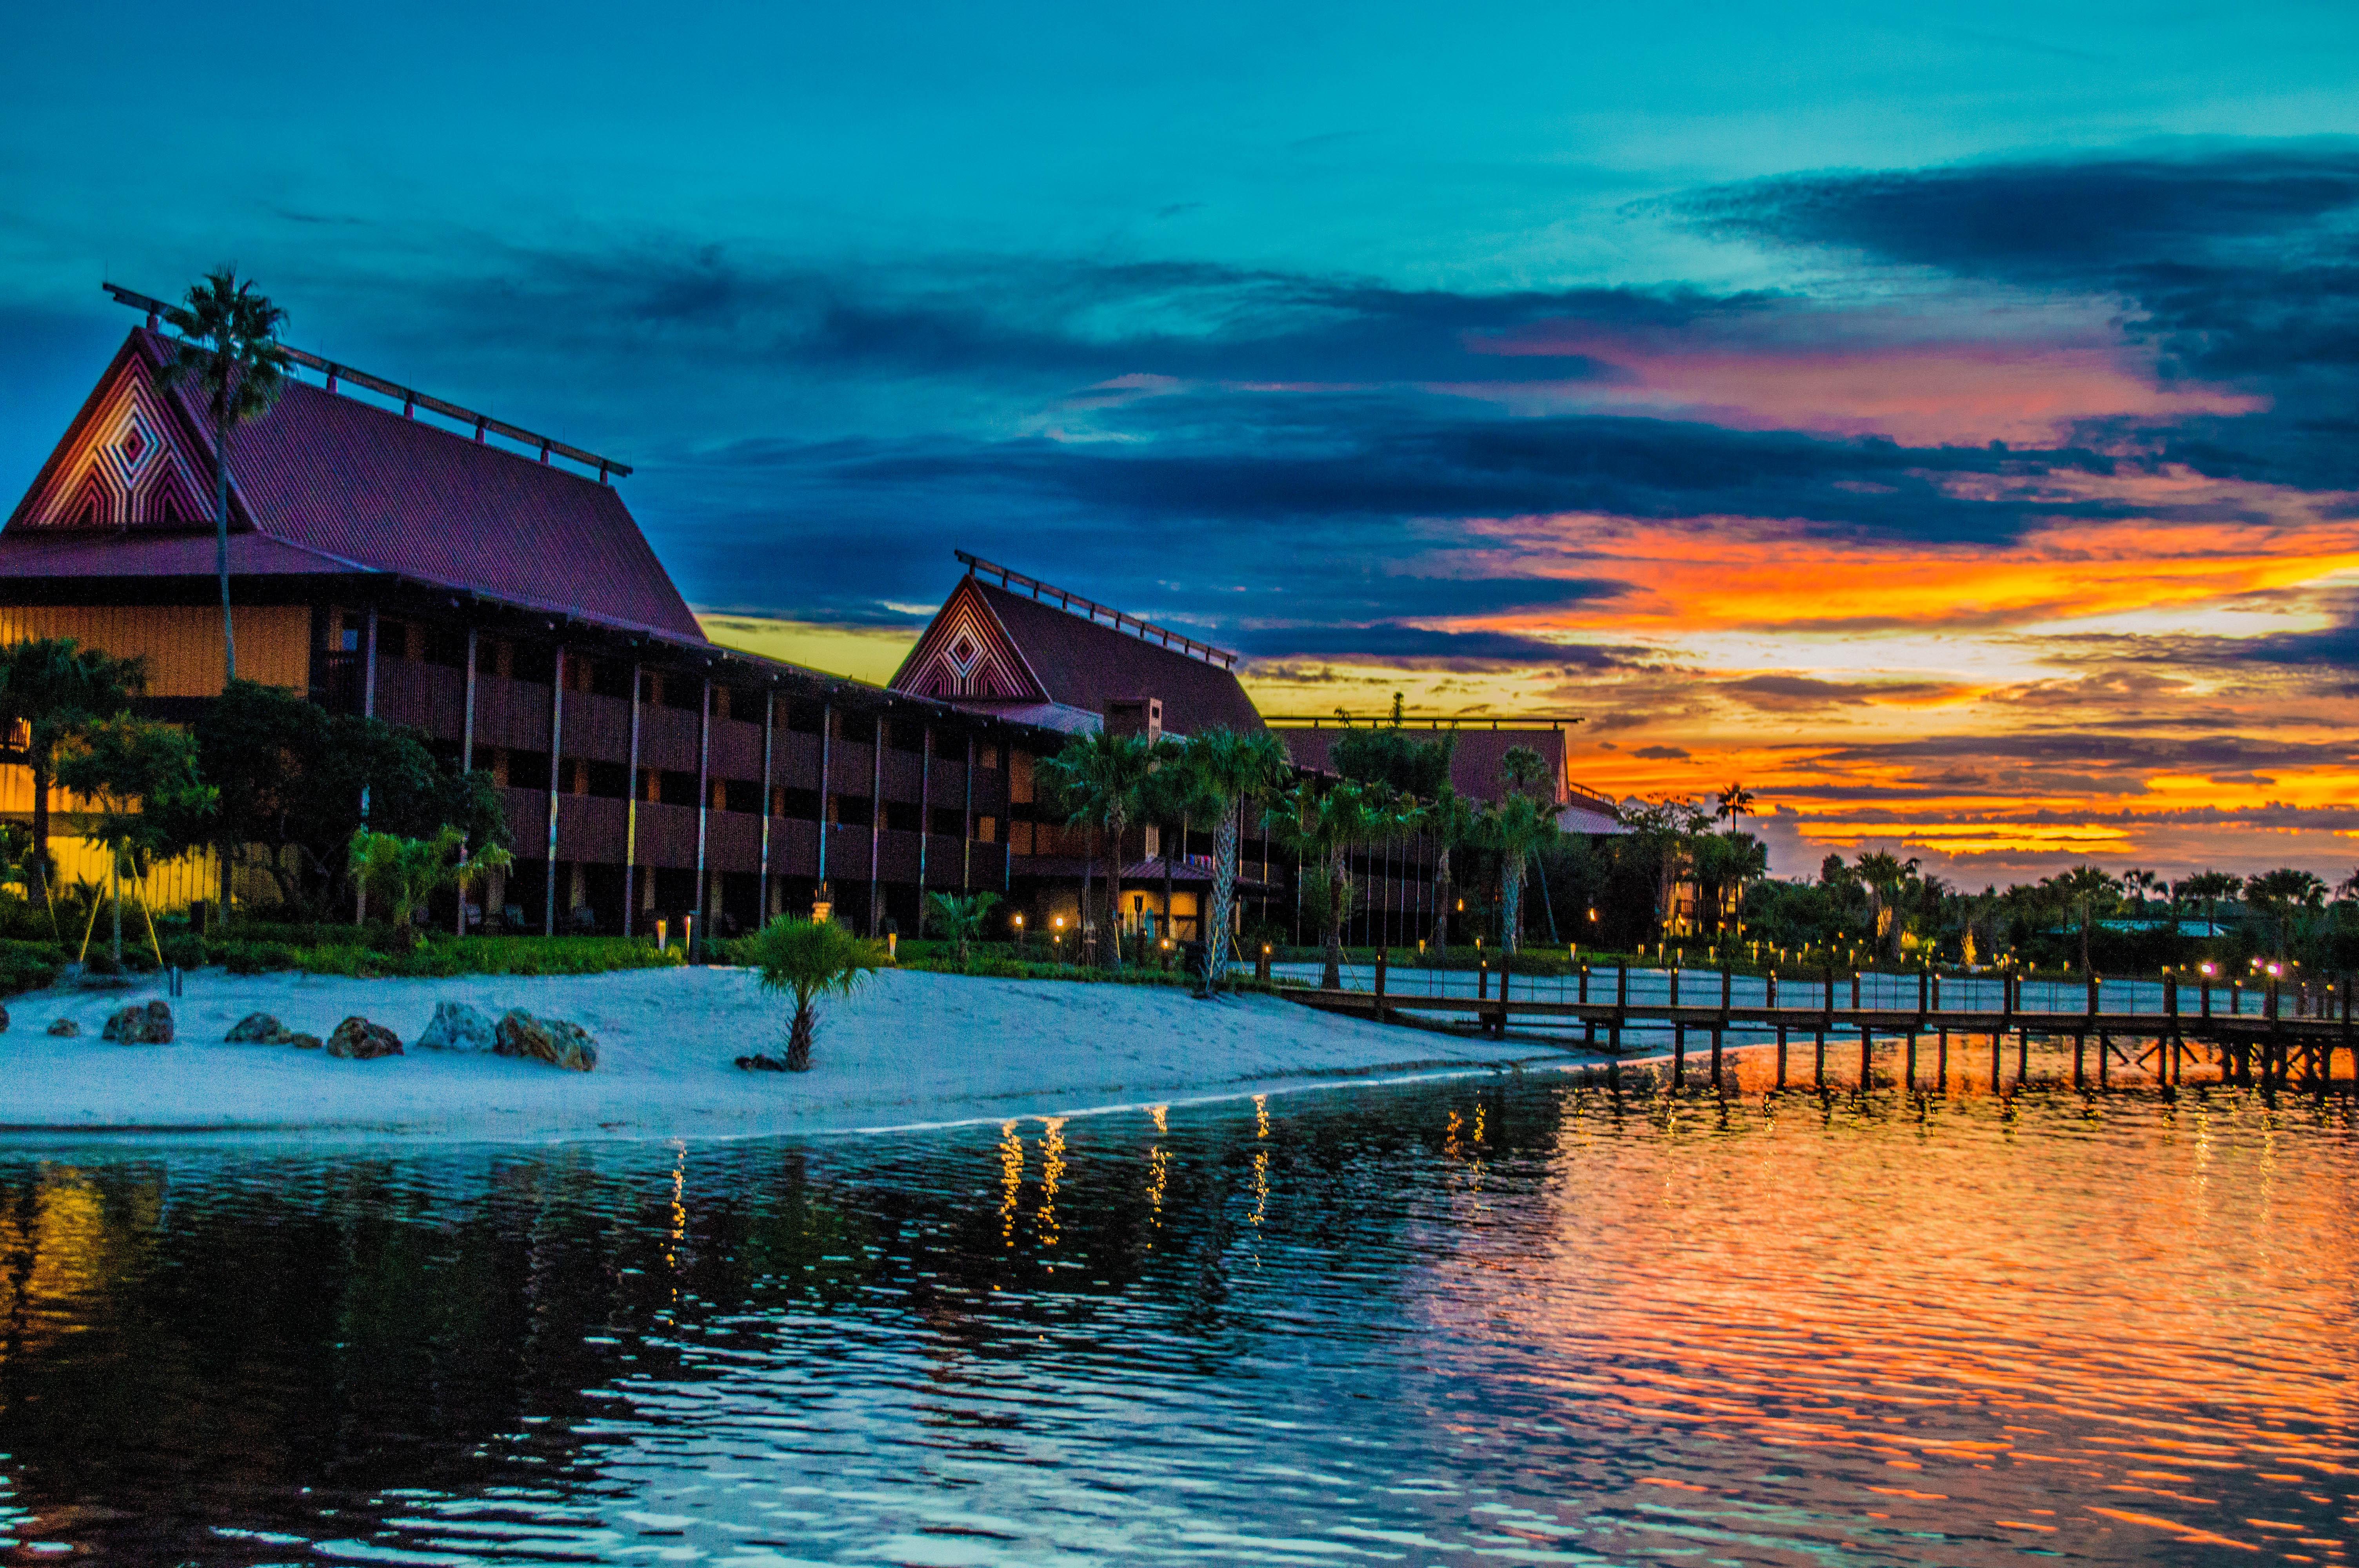 Disney done right top ten resort lobbies Sunset lodge